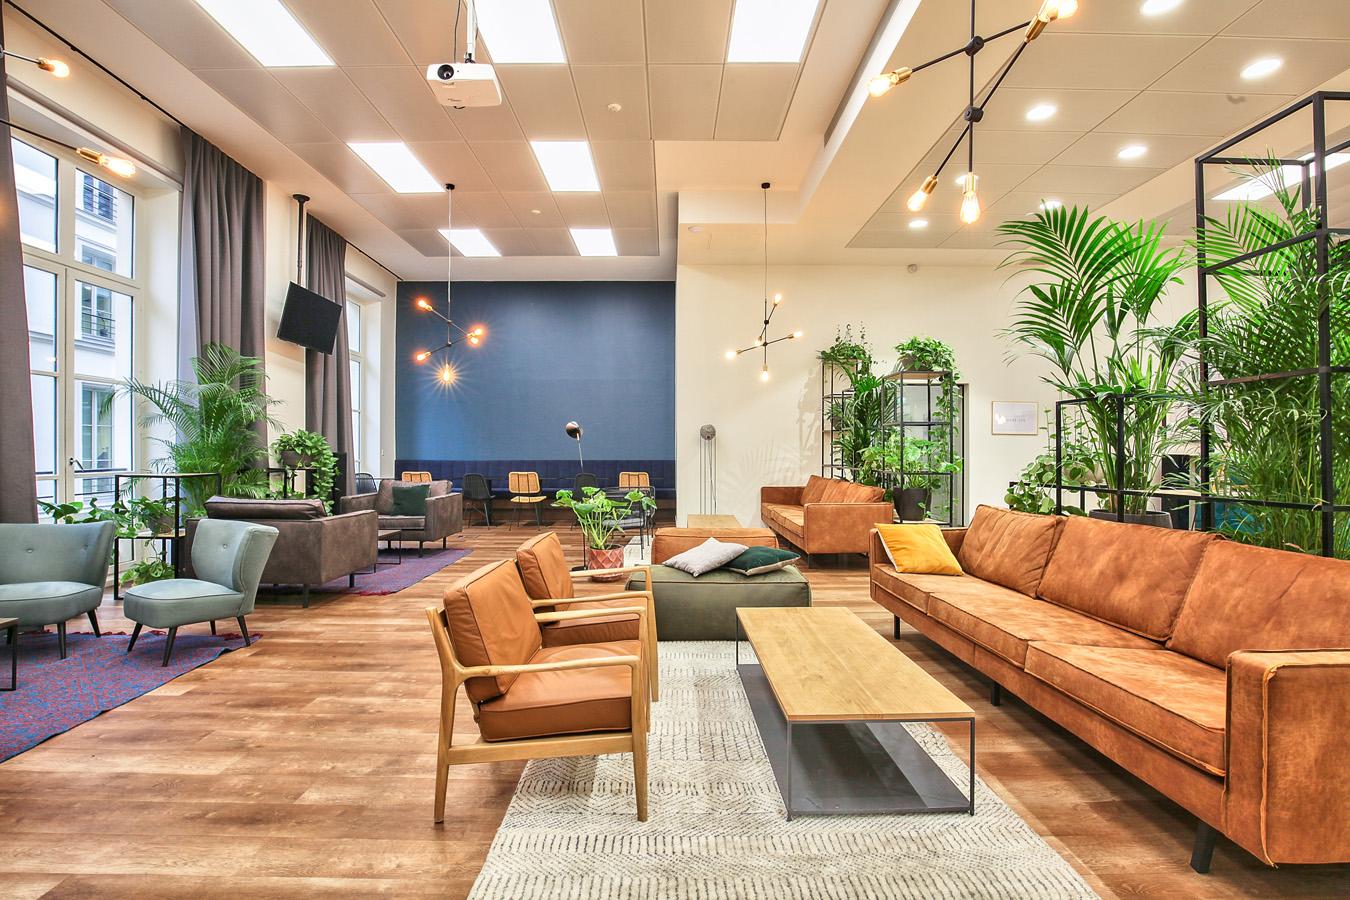 nicolas vade - architecture interieur - bureaux design - Aircall - Salon 3.jpg